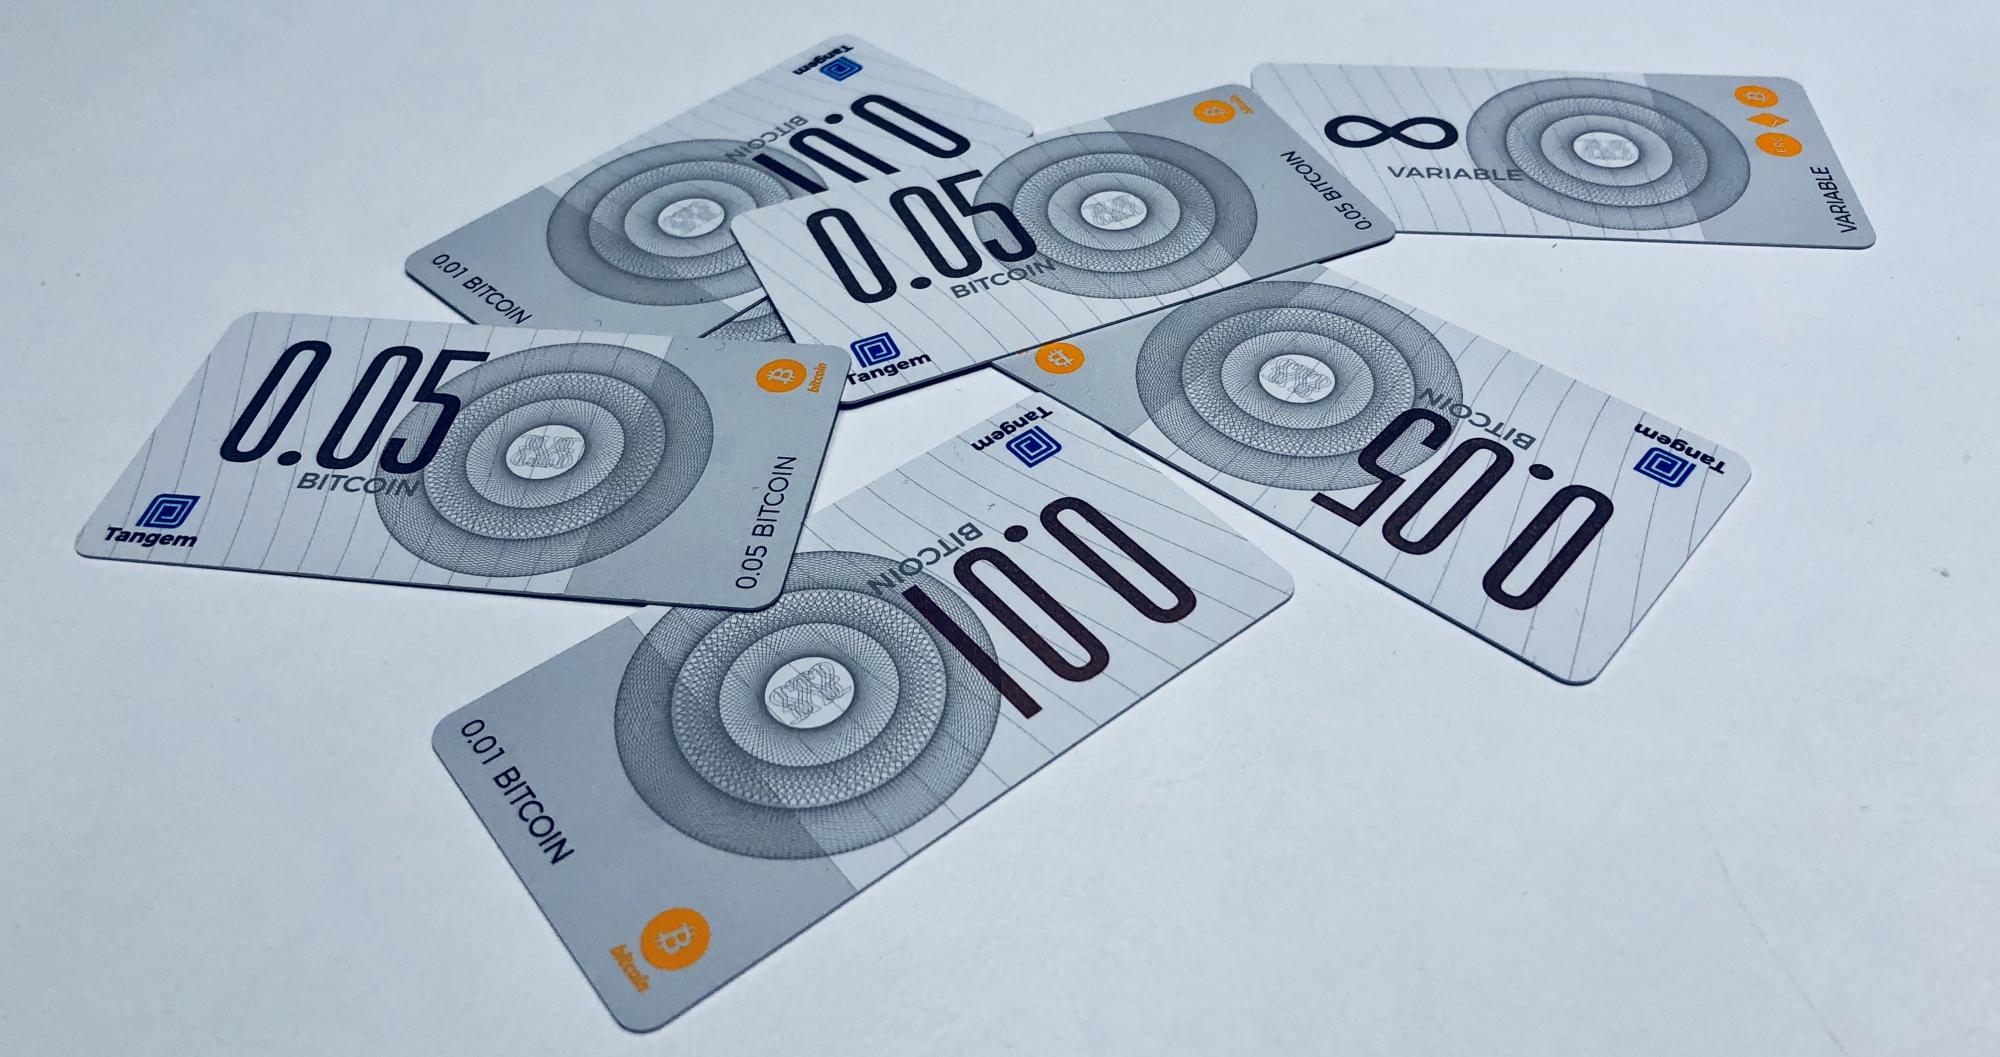 0 05 bitcoin bitcoin atm bratislava